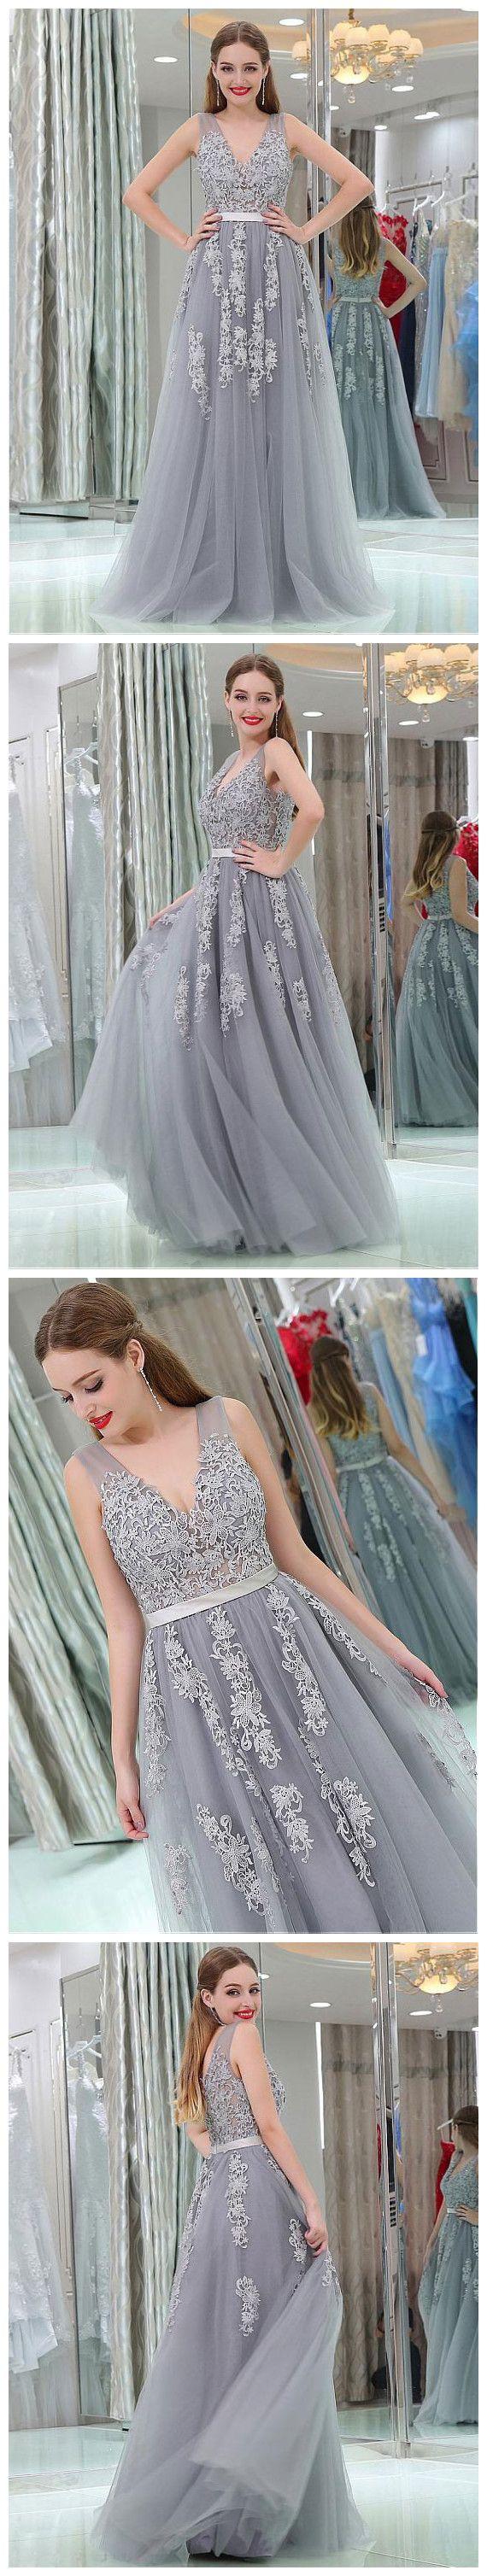 Chic silver prom dresses long aline v neck applique prom dress